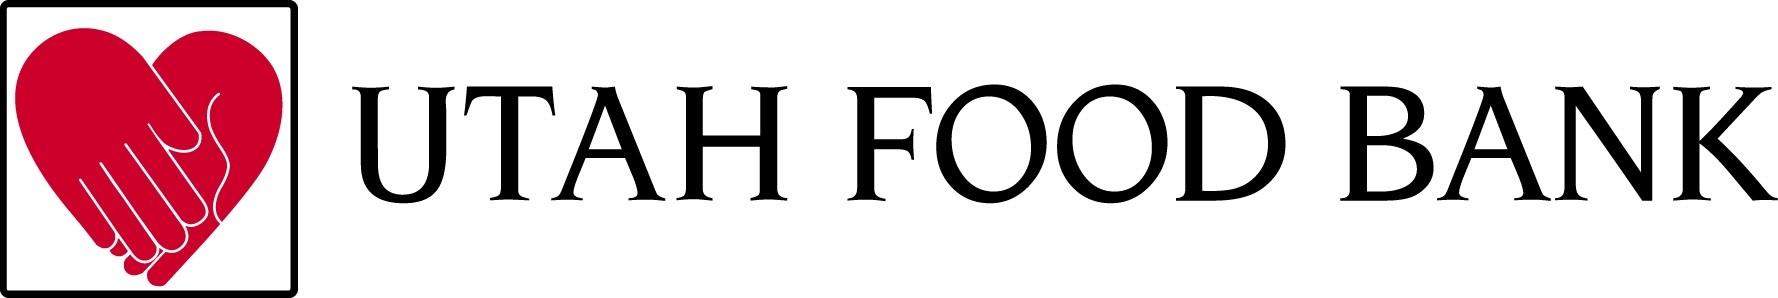 horizontal_logo_color_large.jpg